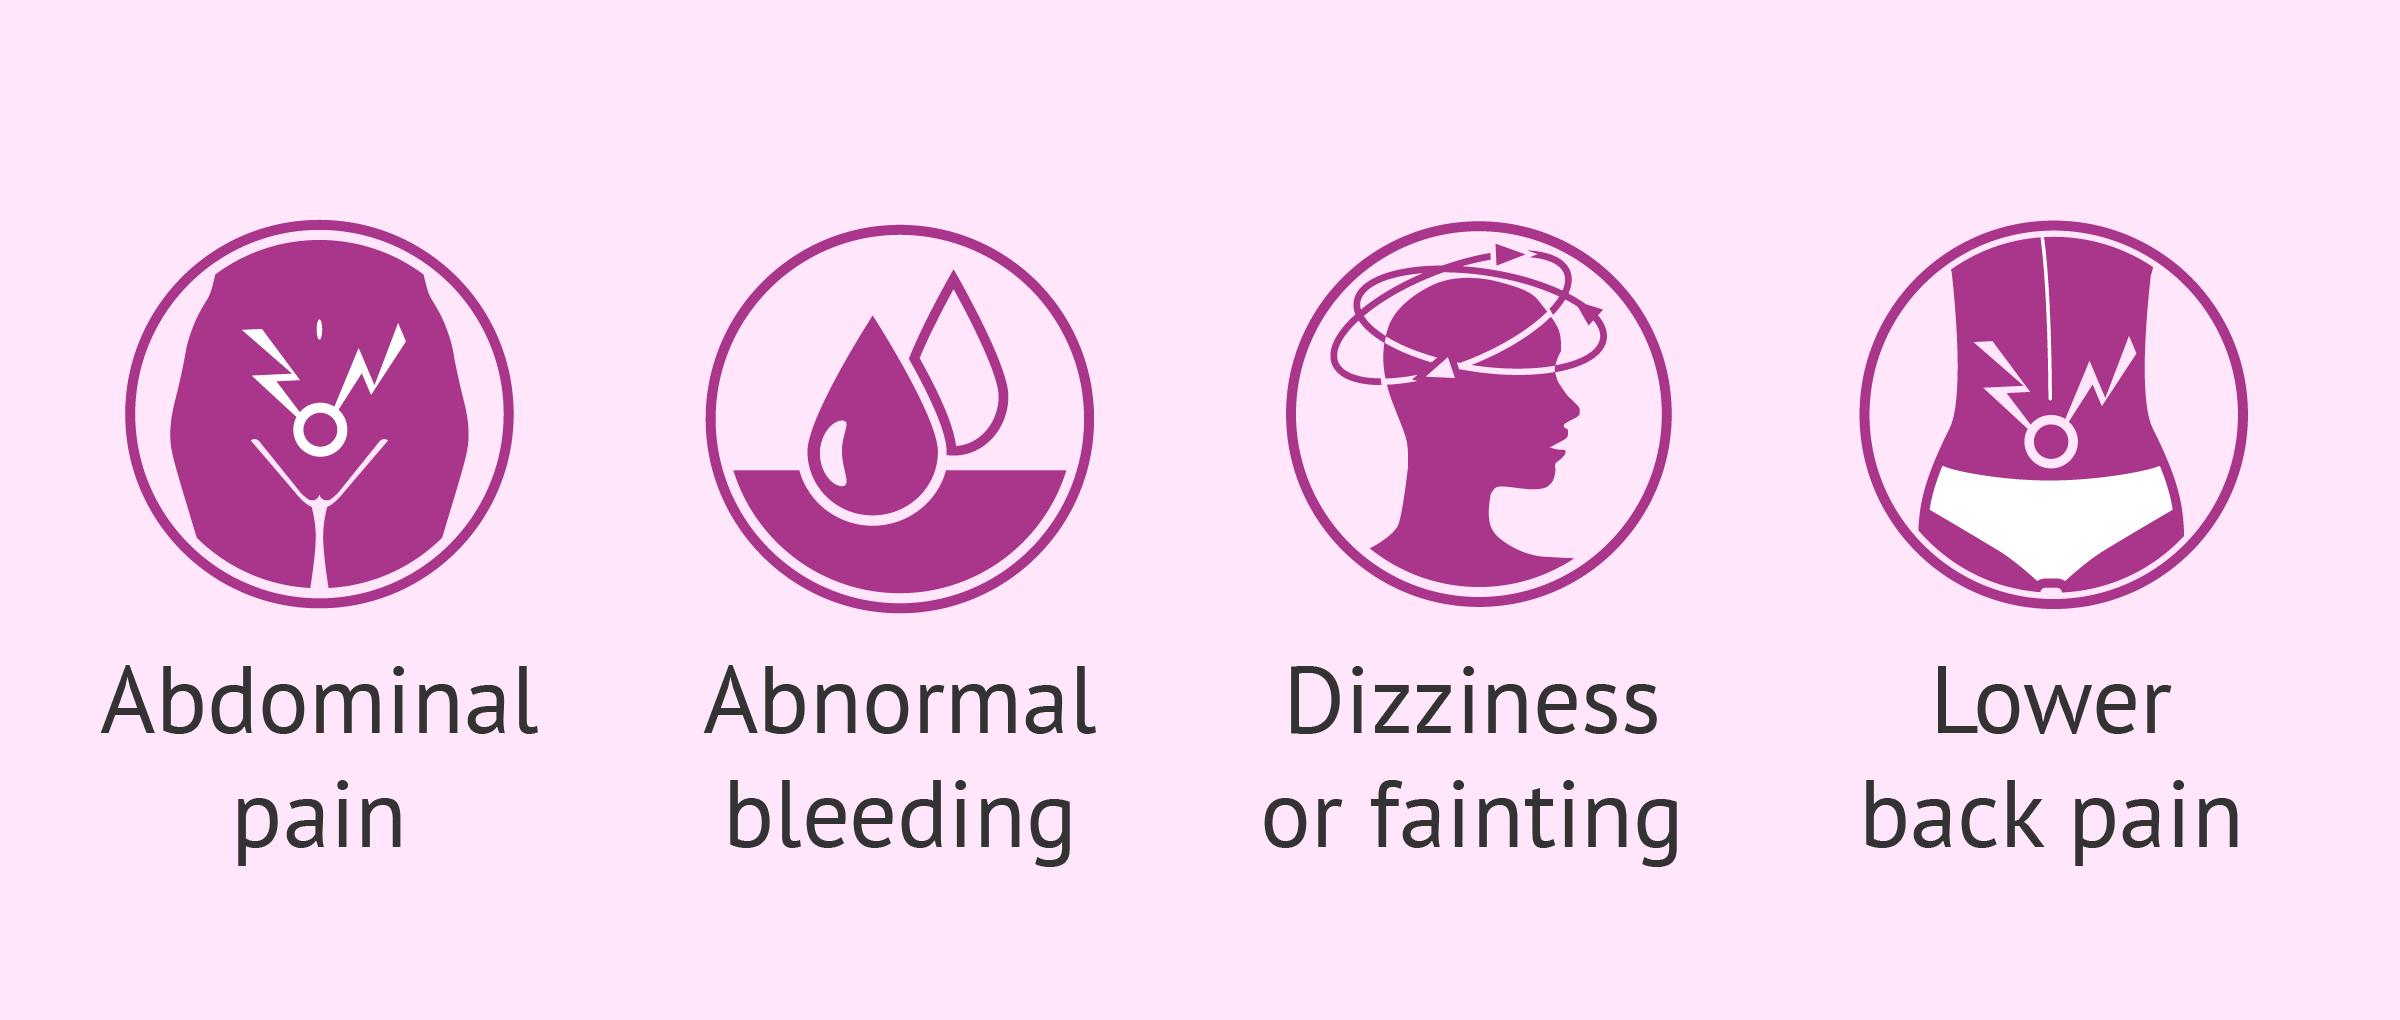 Symptoms of ectopic pregnancy